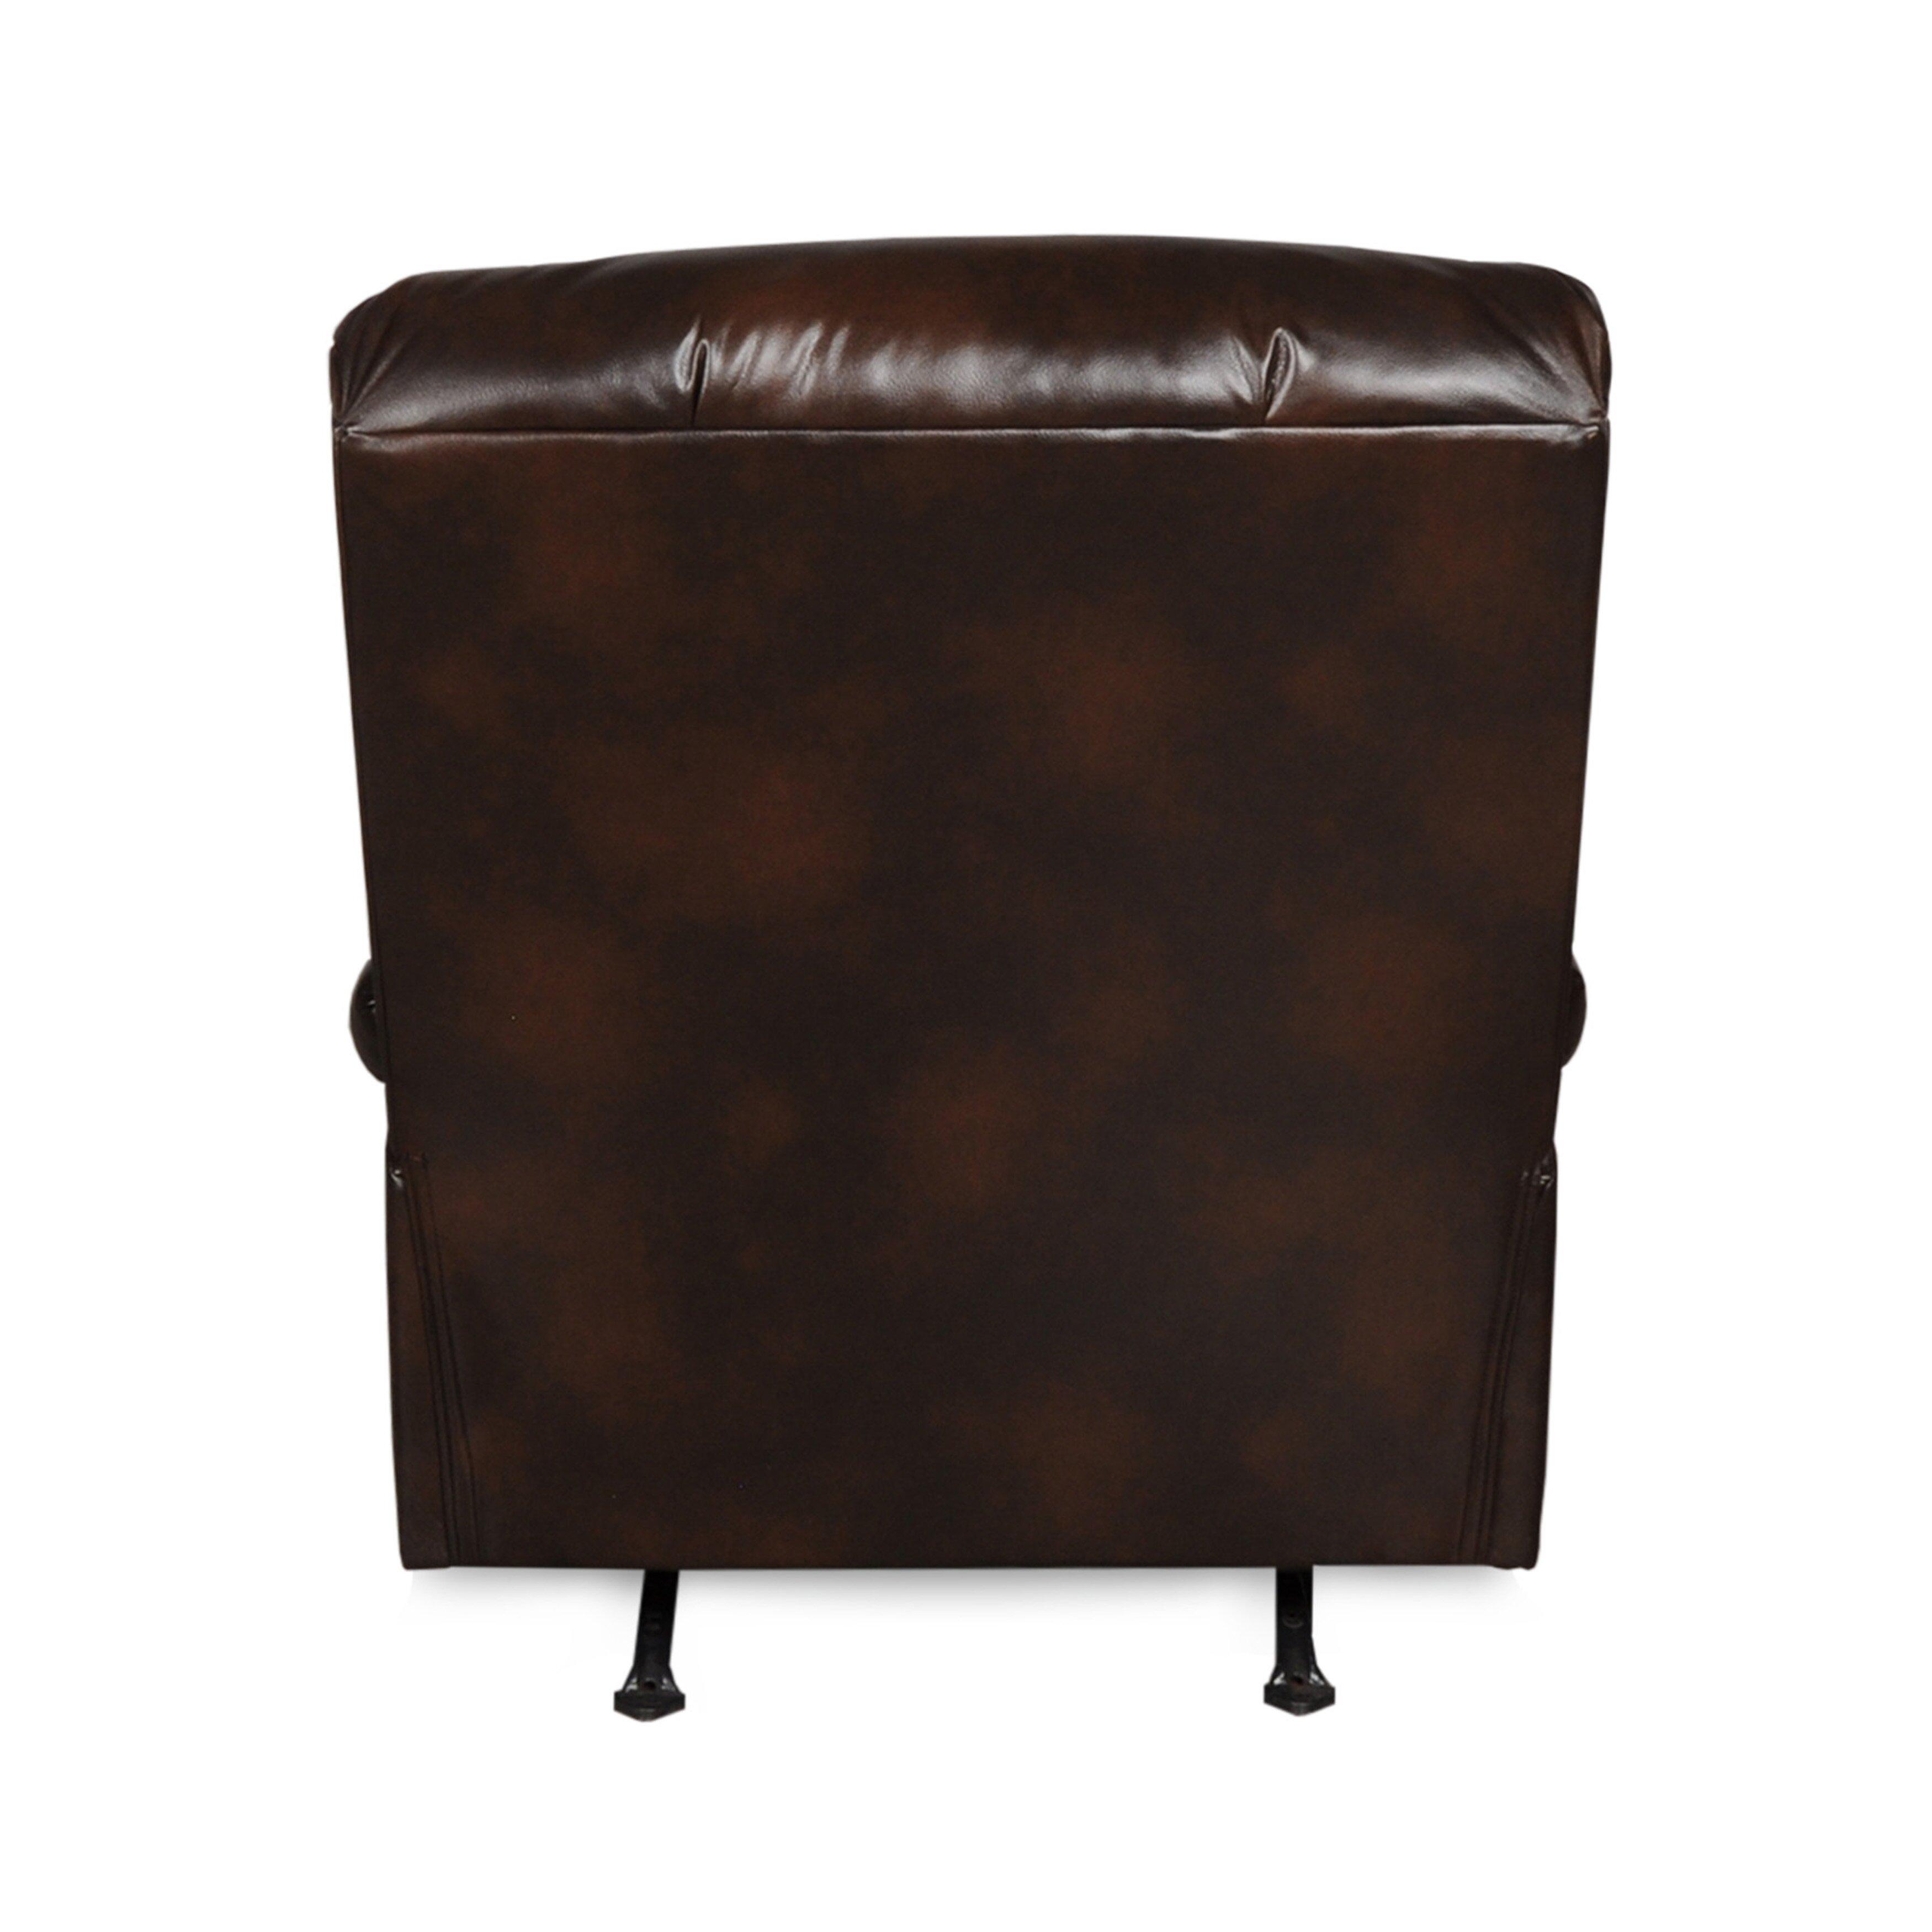 Revoluxion furniture co bailey glider recliner wayfair for Wayfair shop furniture